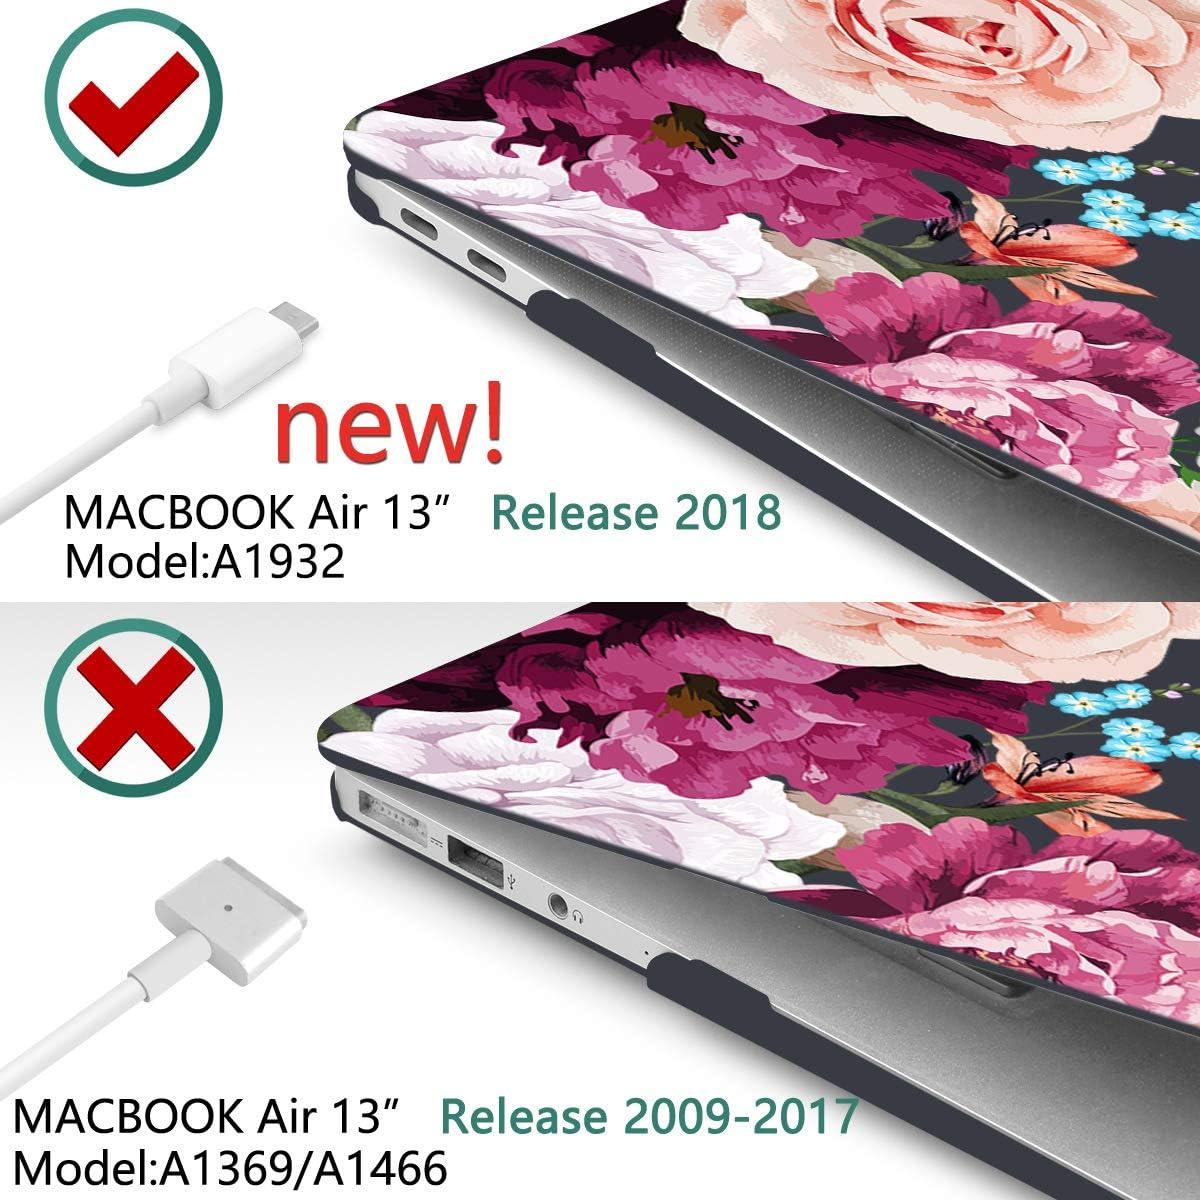 Ocean TwoL 4 in 1 Transparent Print Hard Shell Case for 2020 MacBook Air 13 inch Model A2337 M1 A2179 A1932